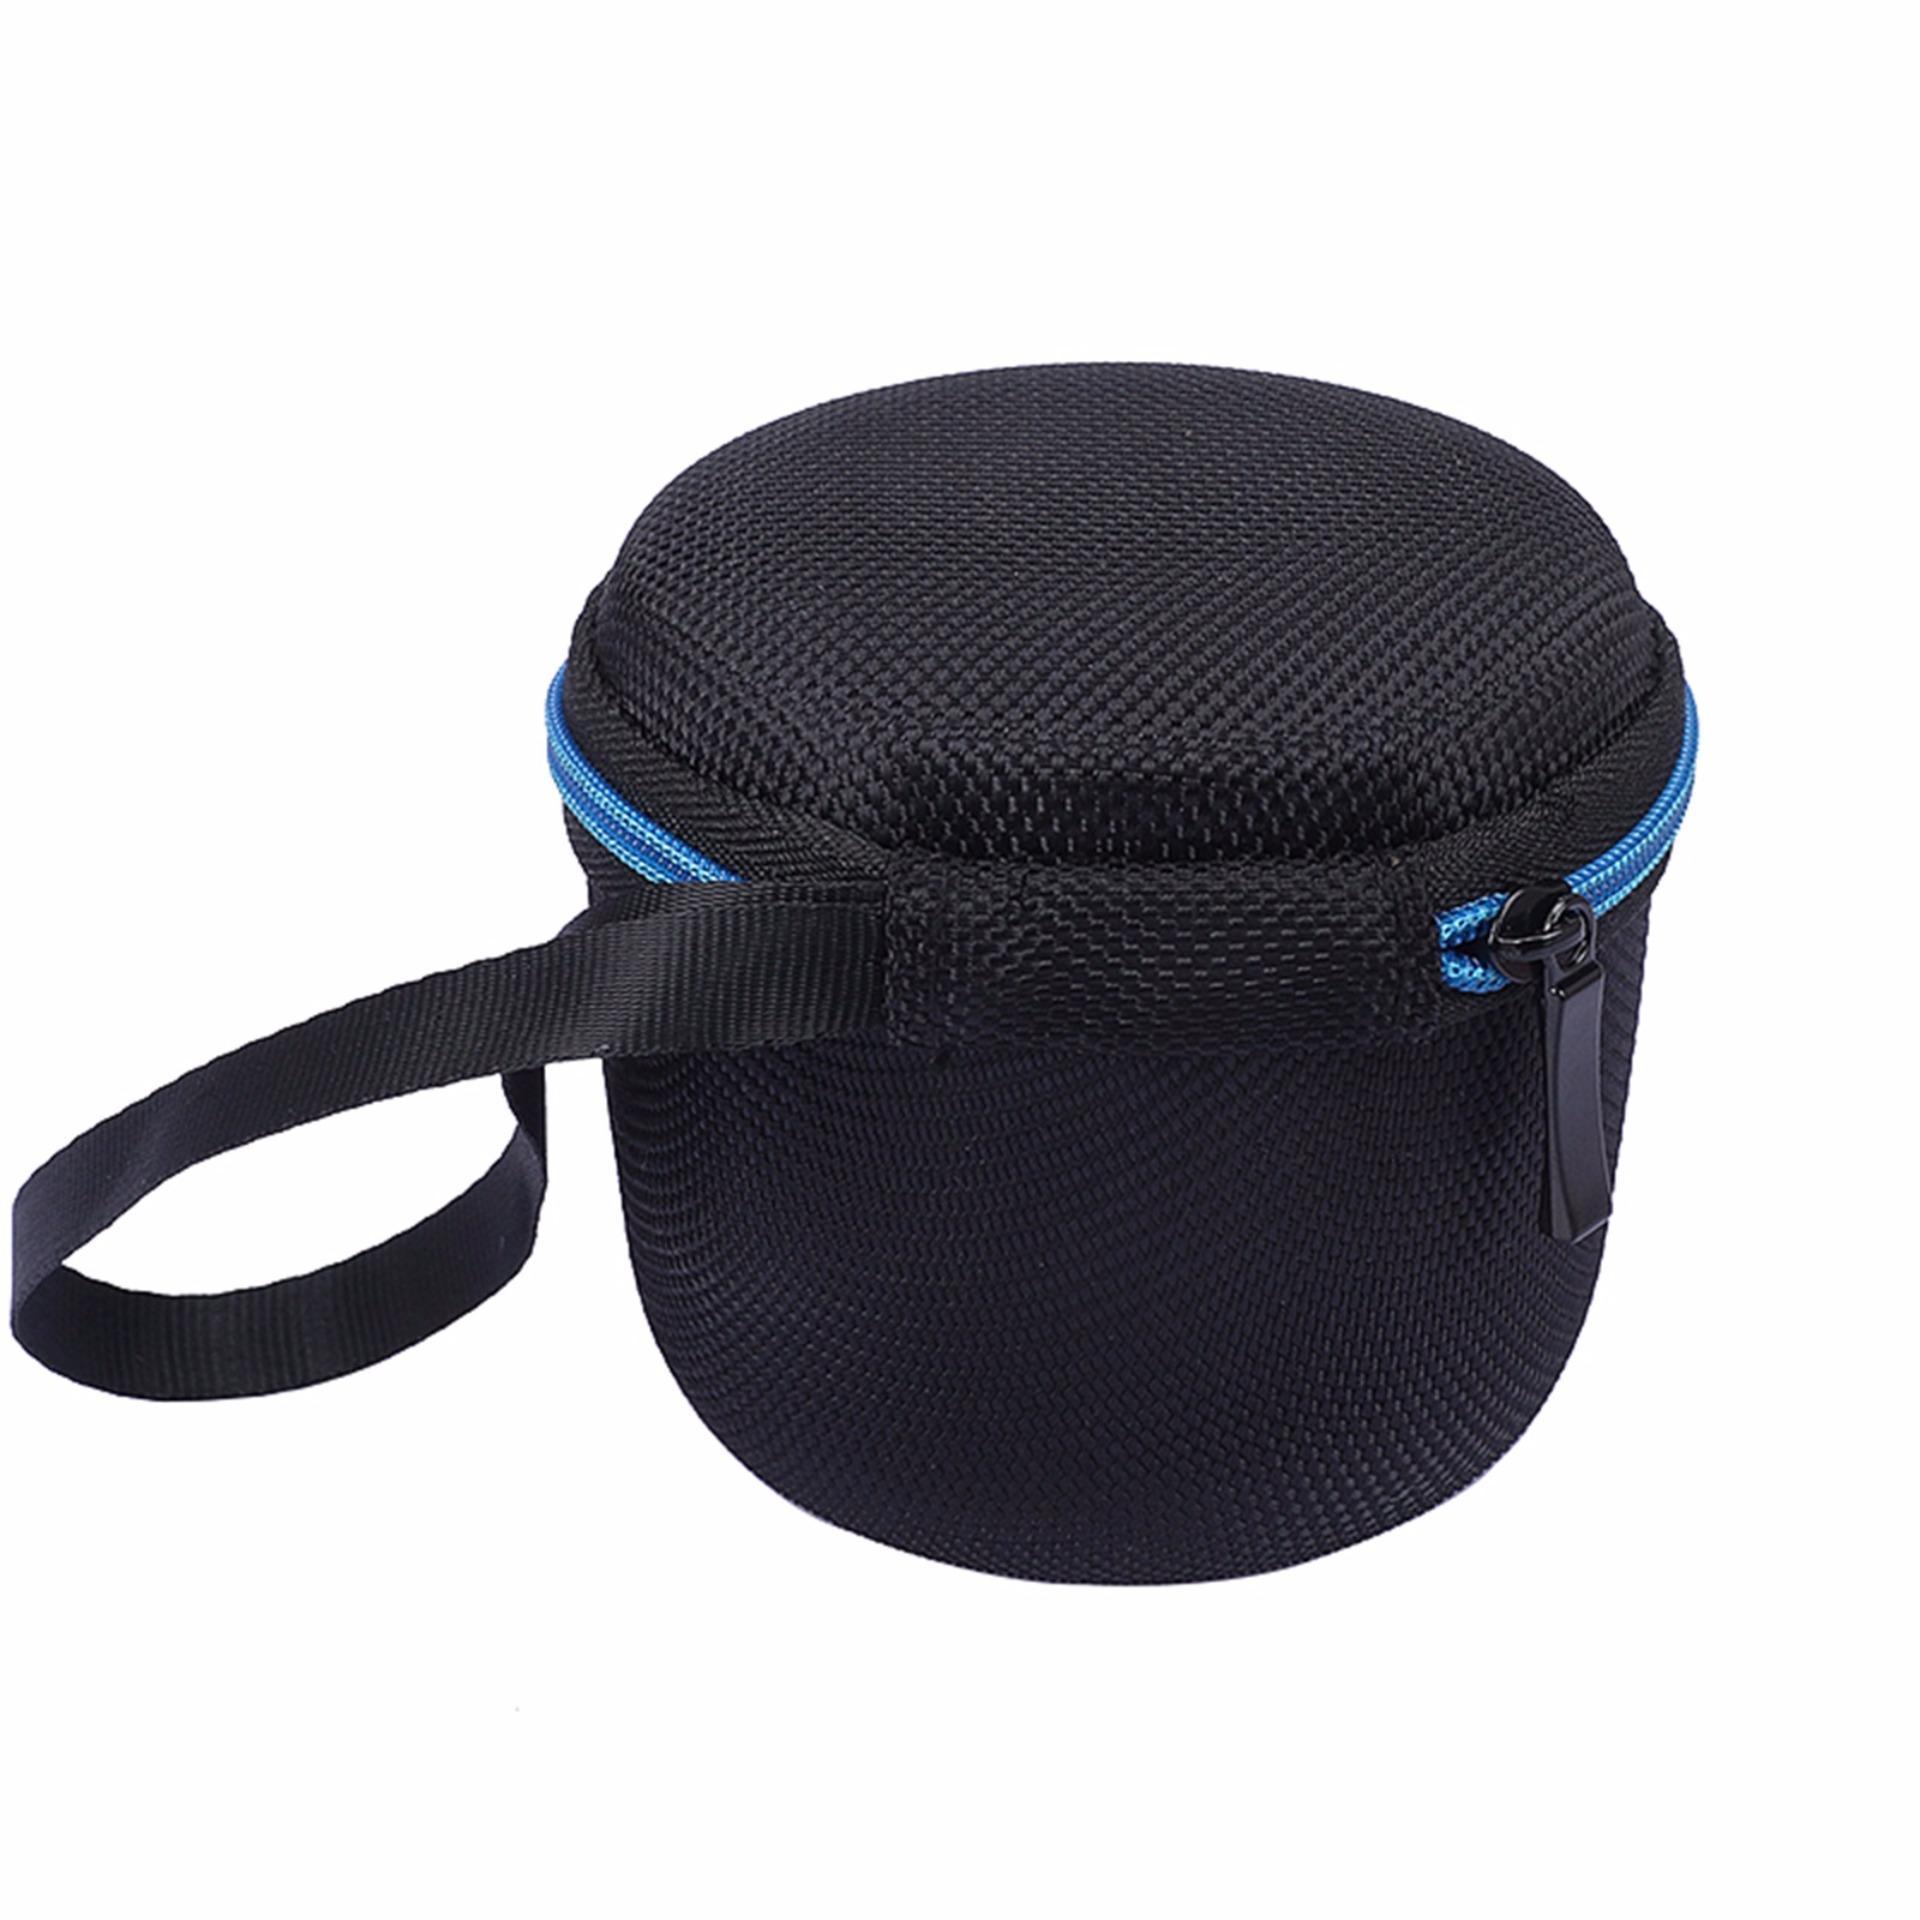 ... Portable Travel Carry Handle EVA hard Case Bag Holder Zipper Pouchfor Anker SoundCore Mini Super- ...